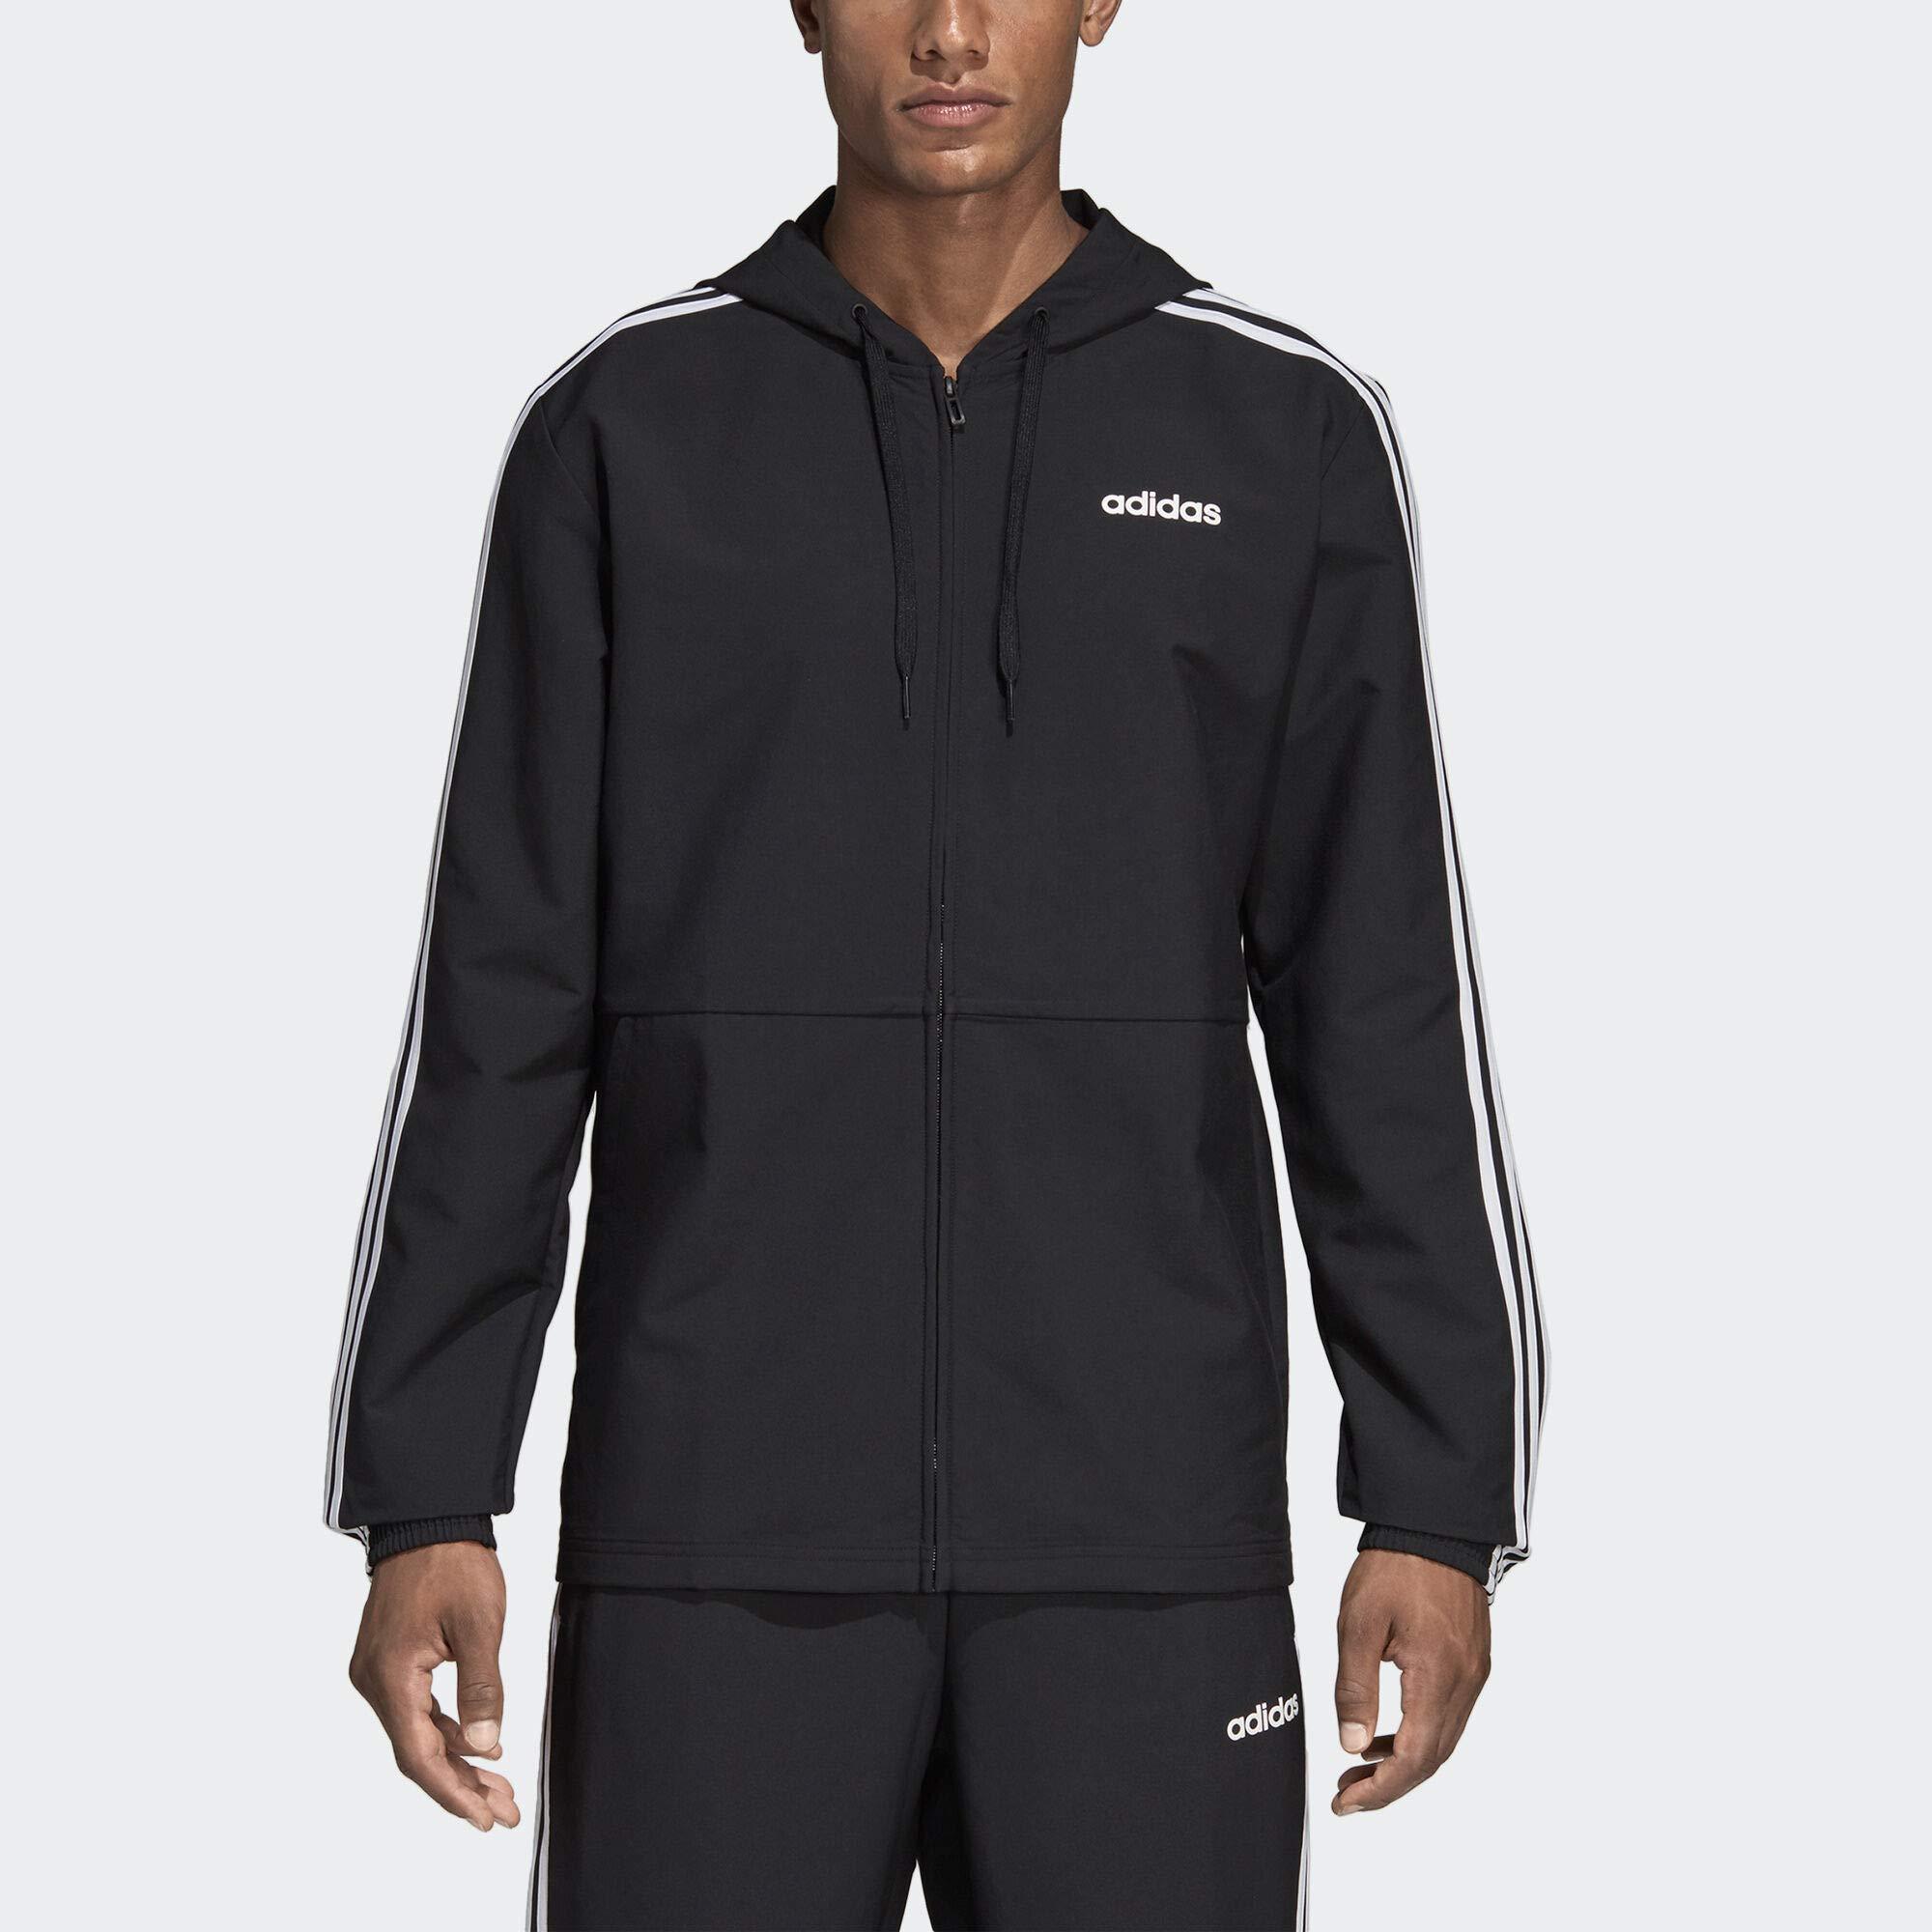 adidas Essentials Men's 3-Stripes Windbreaker, Black/White, Large by adidas